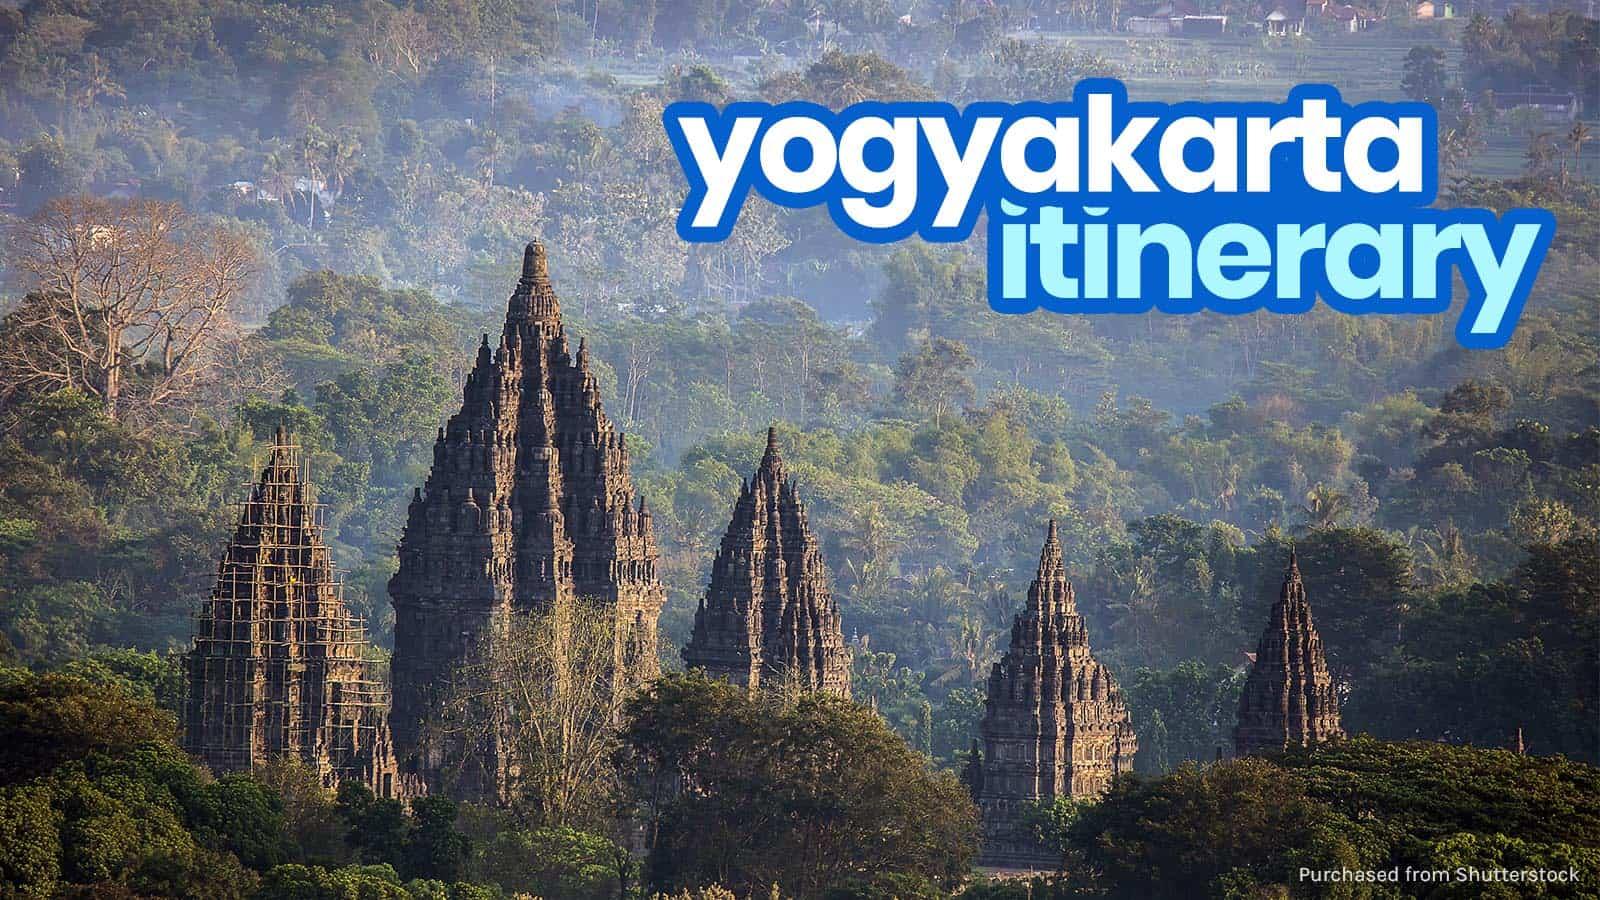 YOGYAKARTA ITINERARY: 8个最值得做的事情 | 穷游者的行程博客